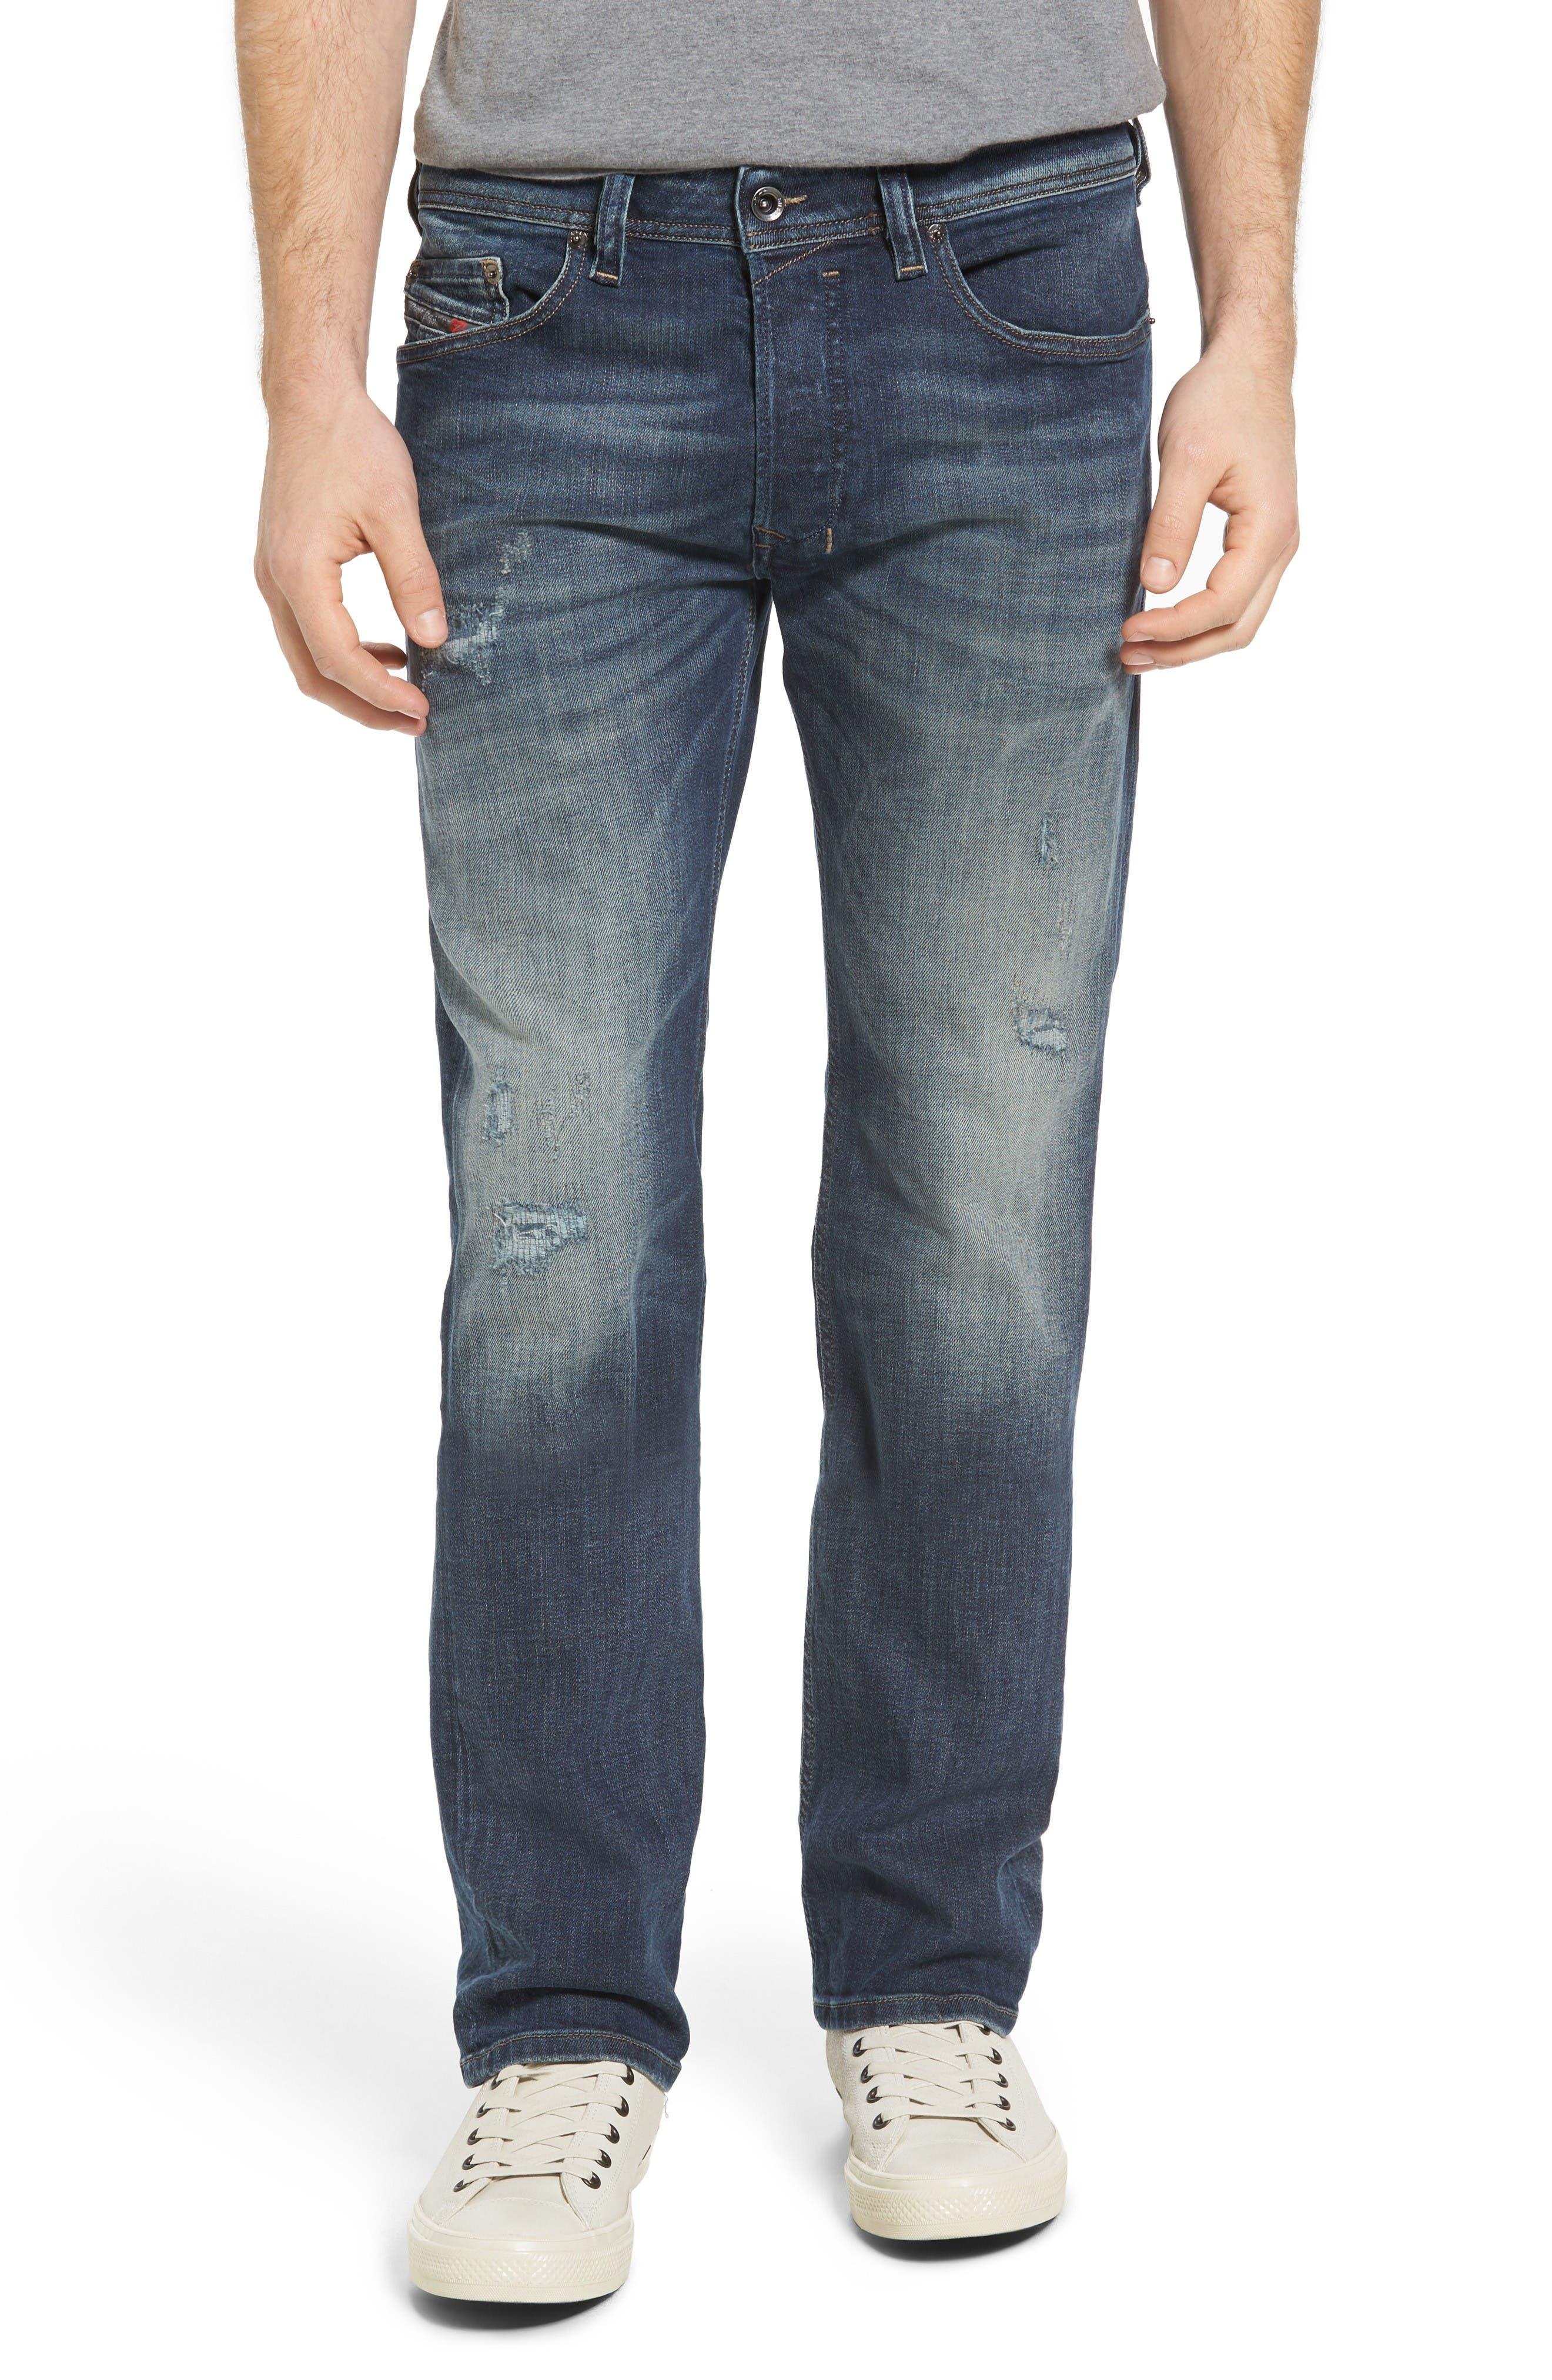 Safado Slim Straight Fit Jeans,                             Main thumbnail 1, color,                             860K